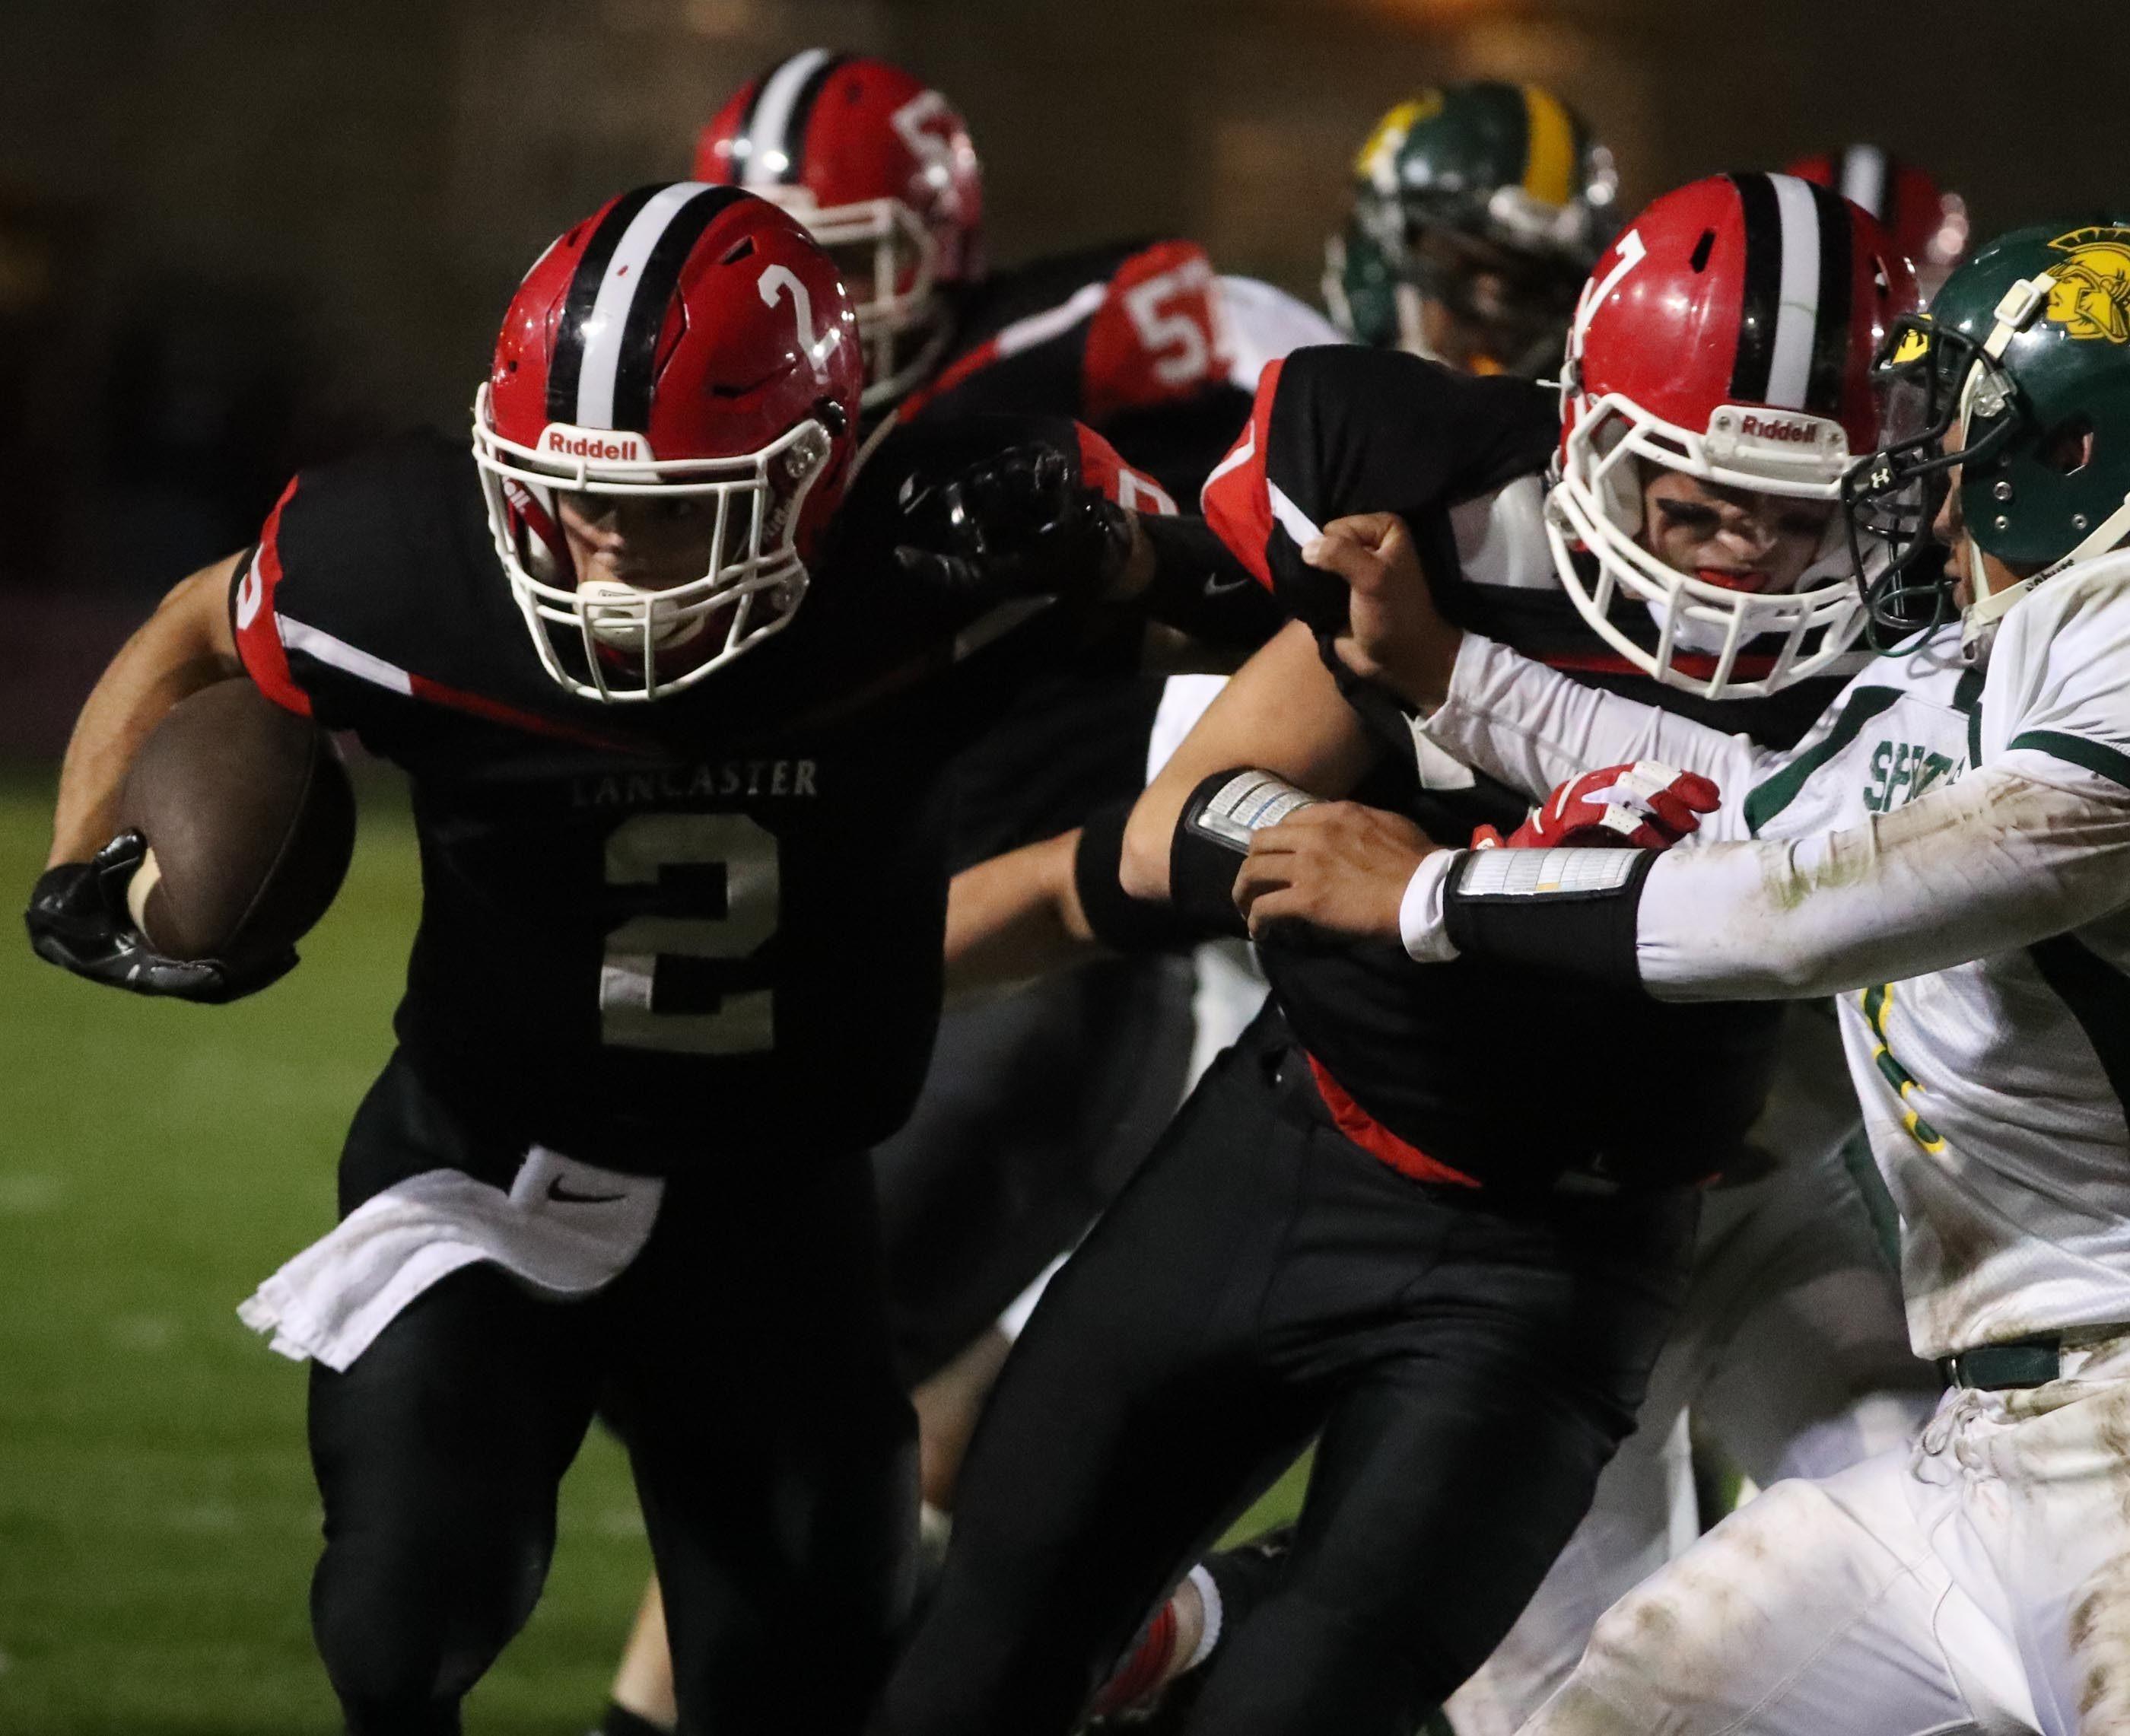 Lancaster's Zach Samborski rushes for a first down against Williamsville North.